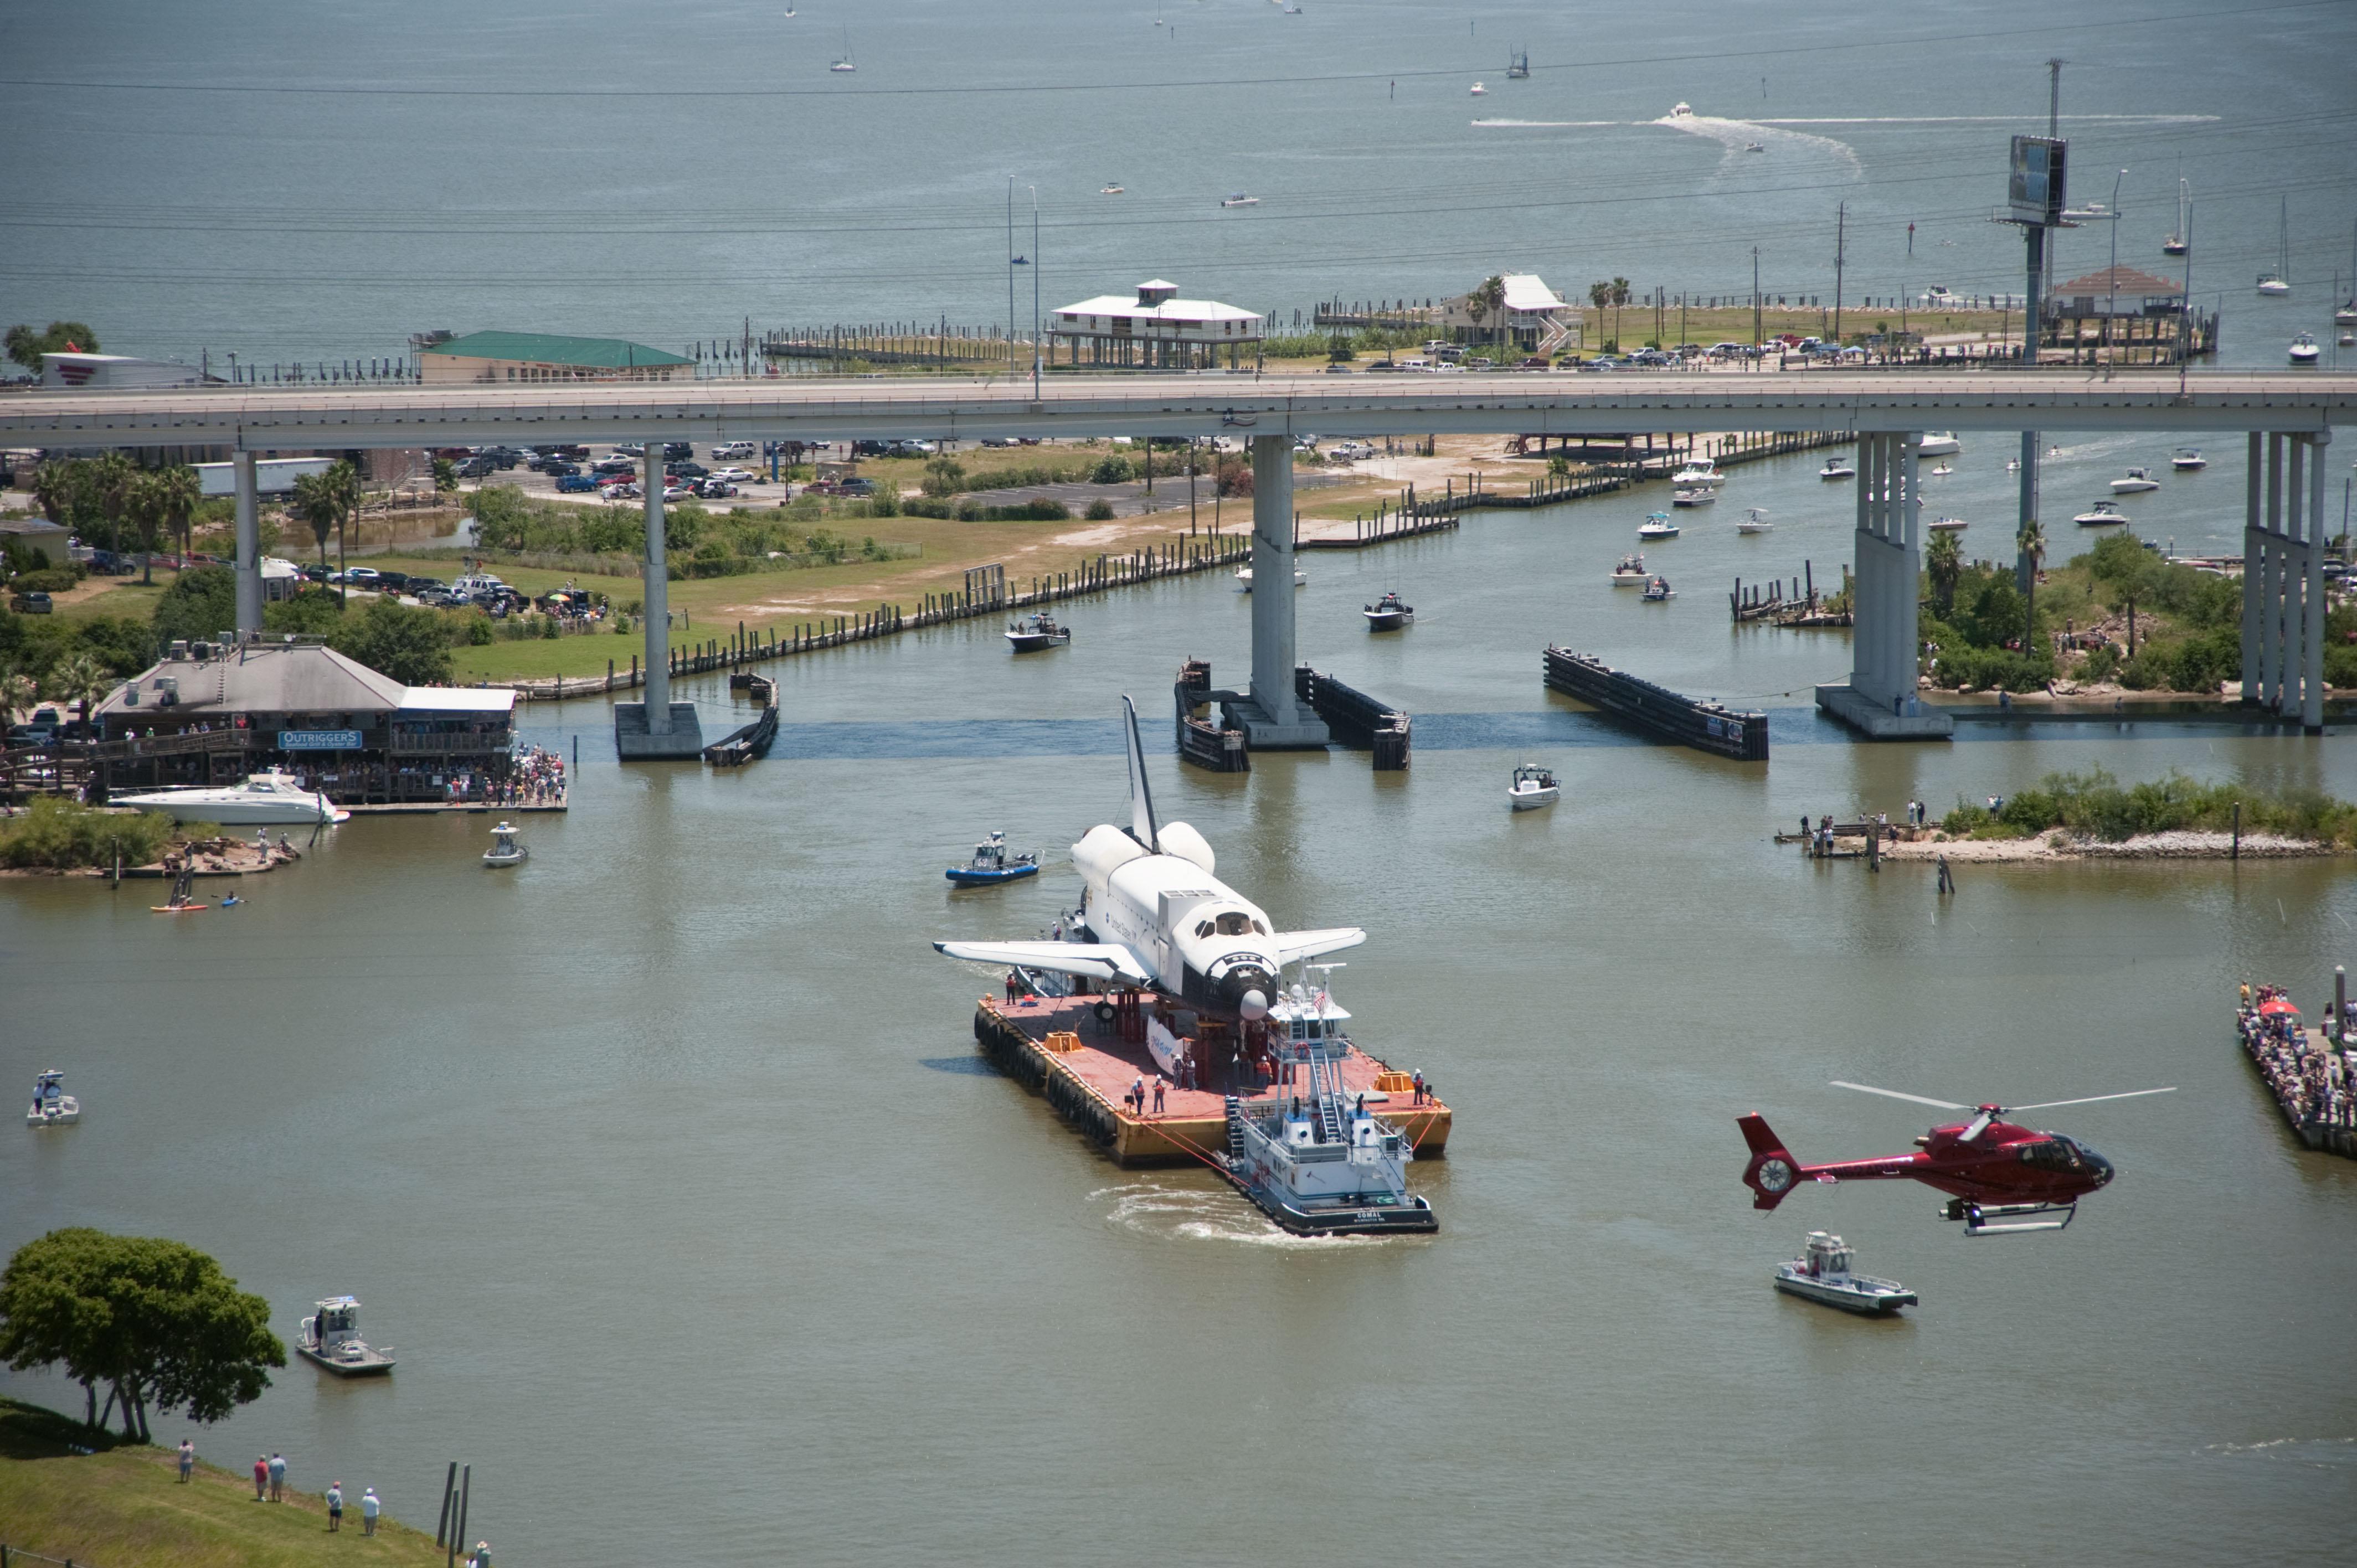 NASA - Shuttle Replica Completes Journey to Houston